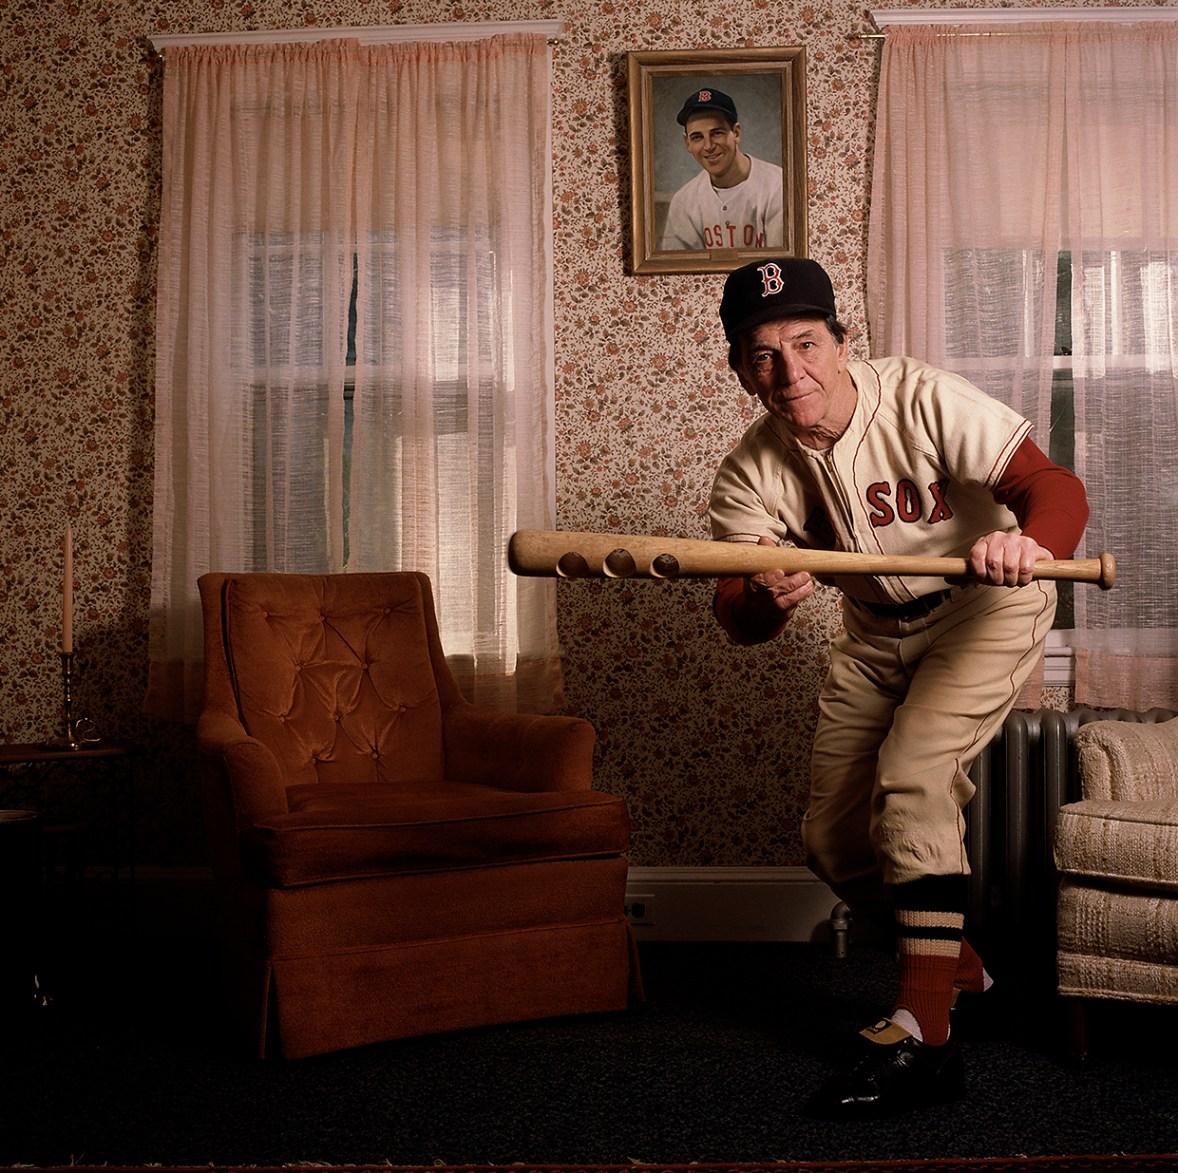 Eddie Pelligrini, Baseball Player for Boston Red Sox © William Coupon